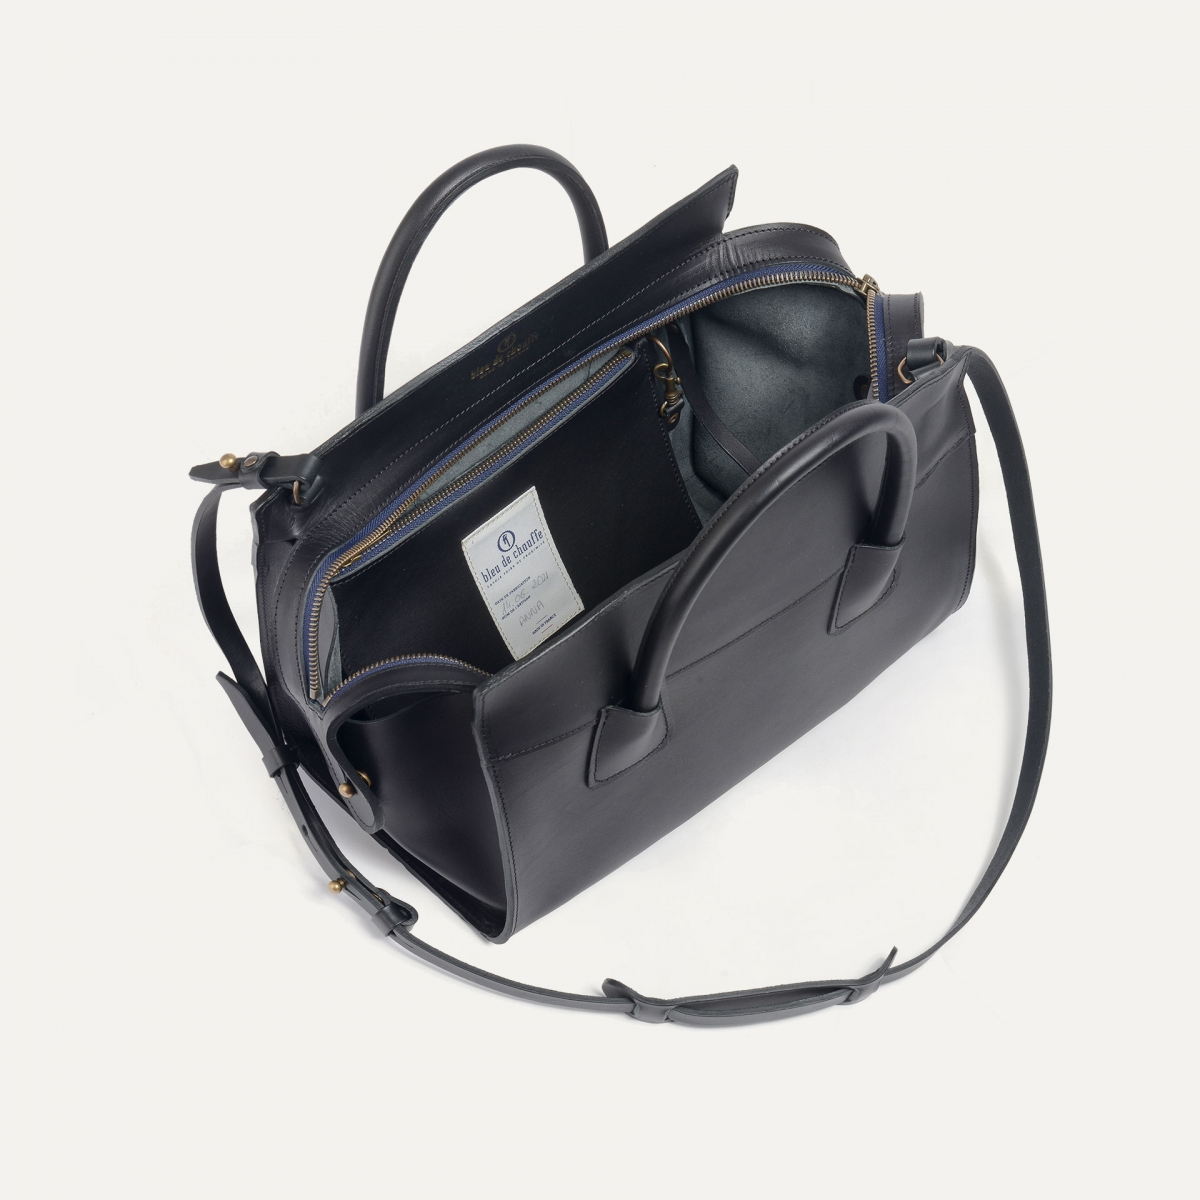 Origami M Zipped Tote - Black (image n°4)